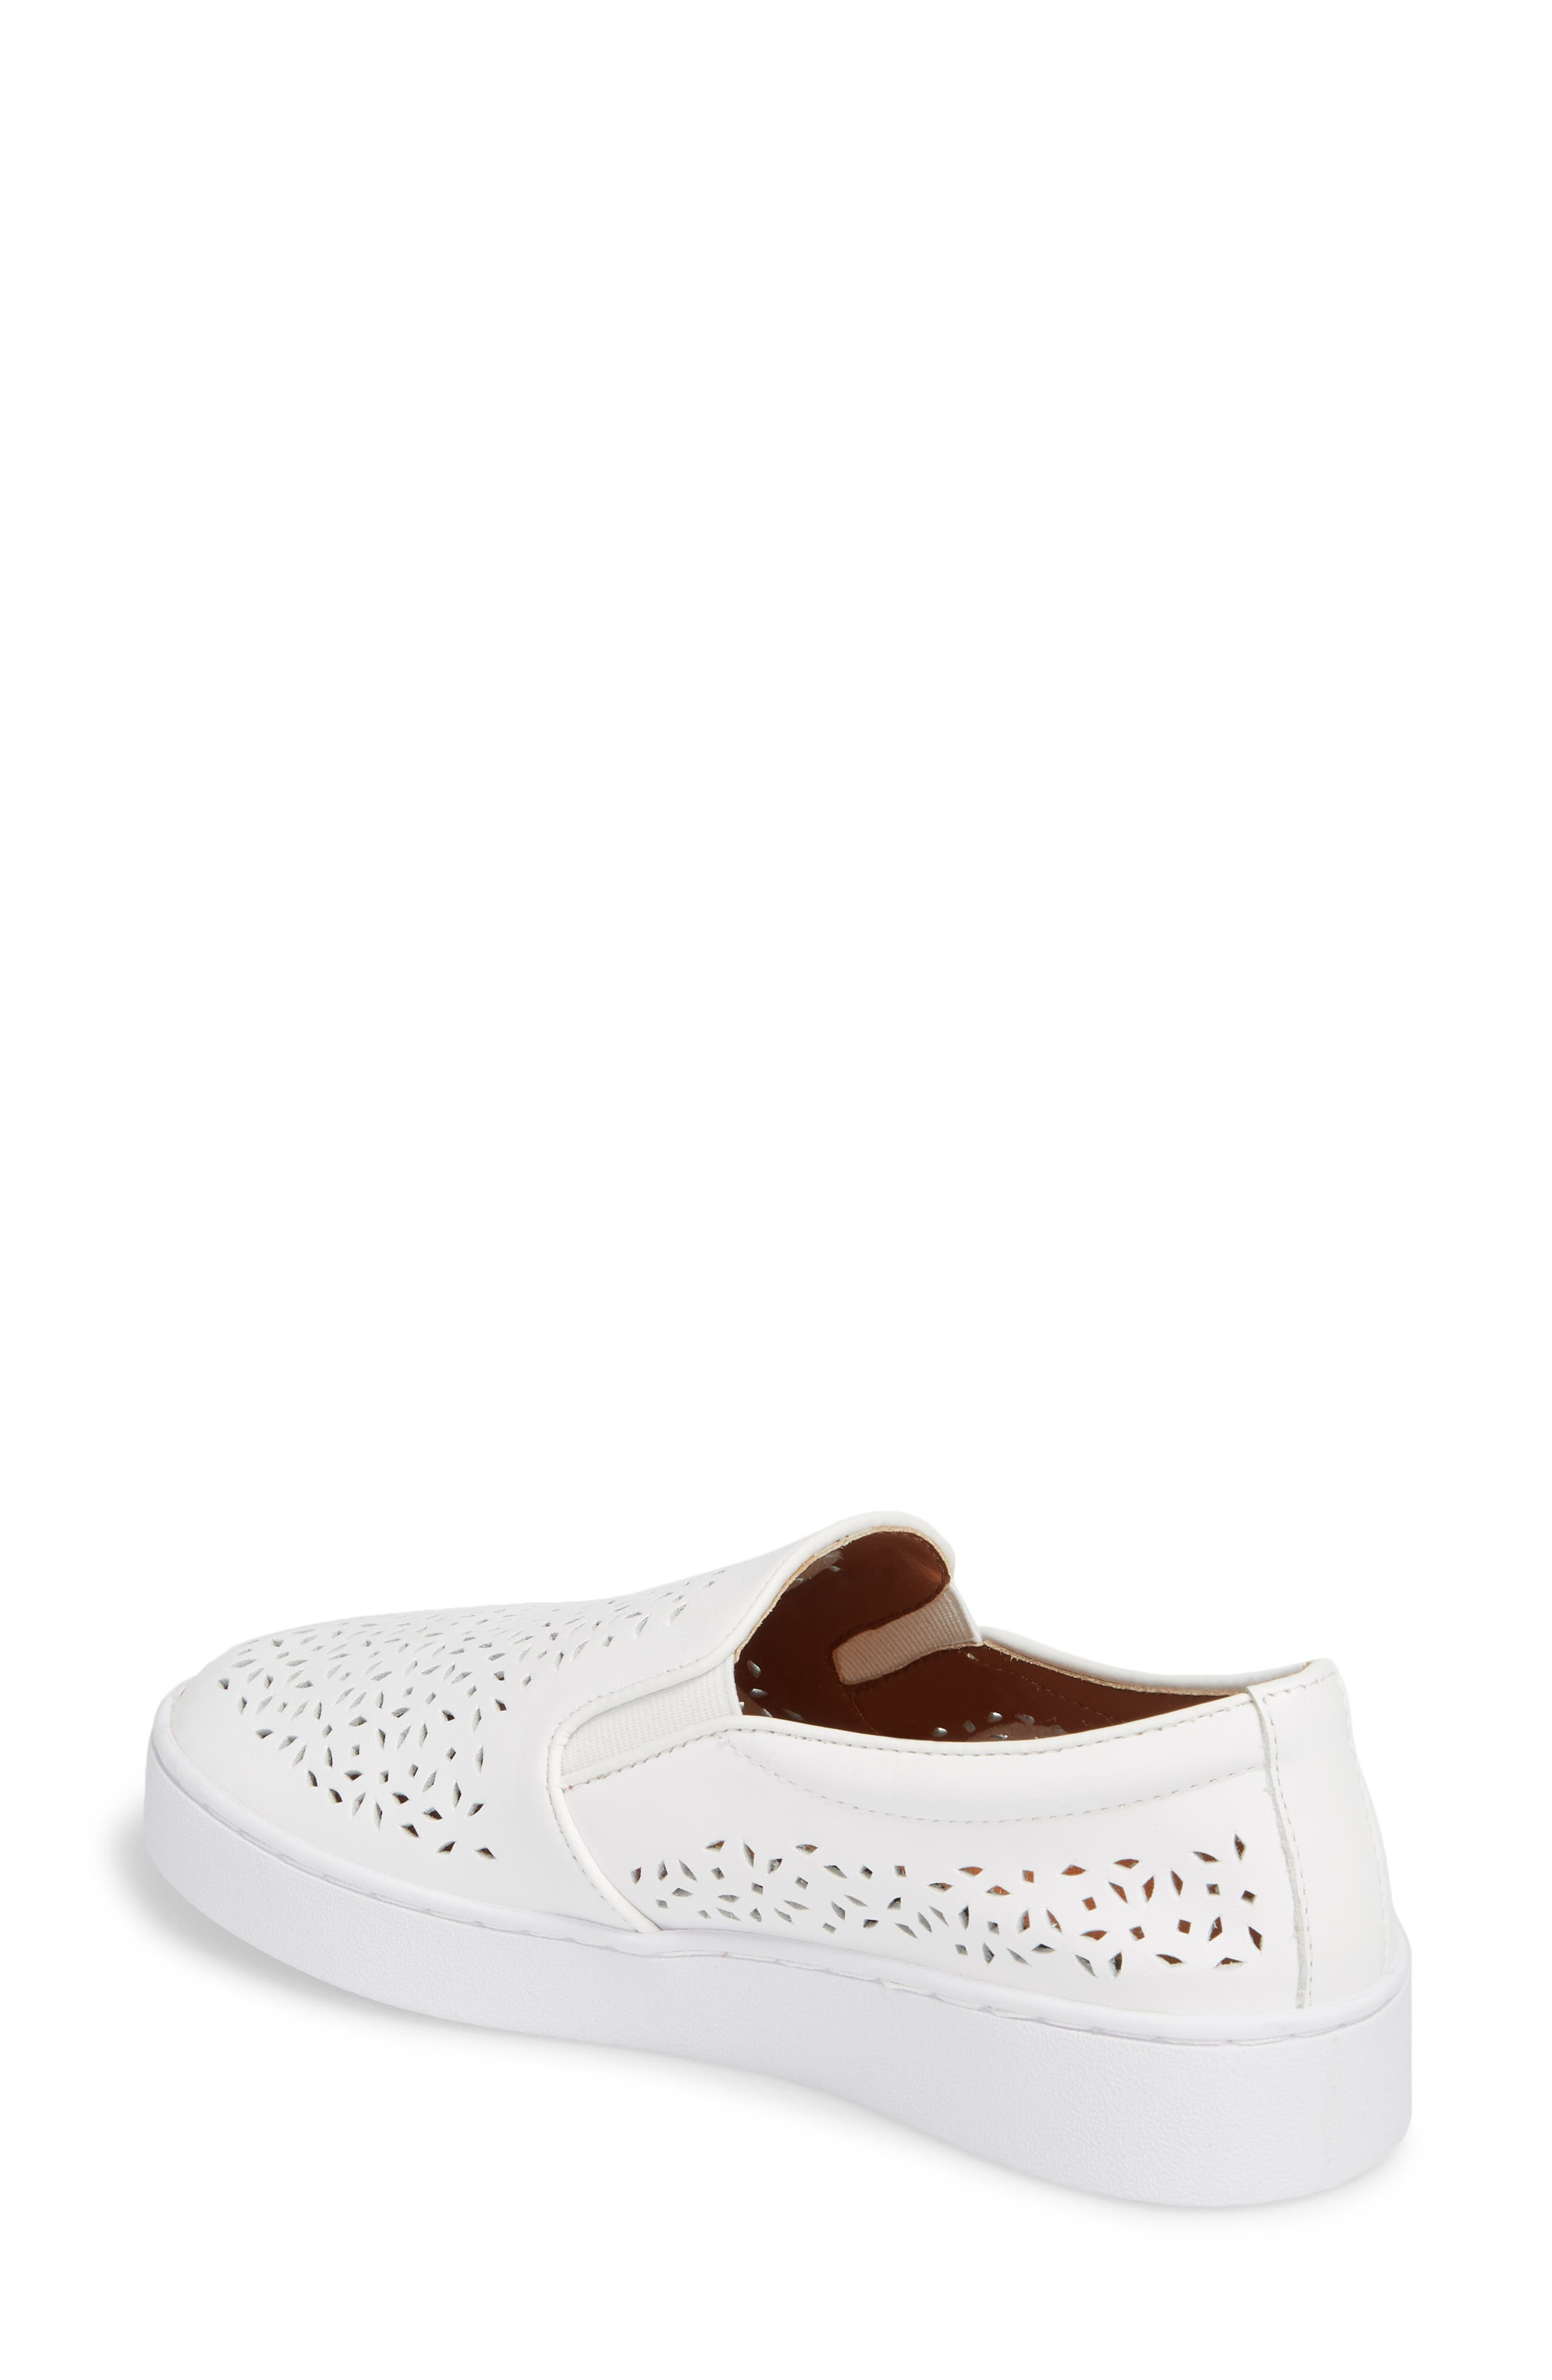 Perforated Slip-On Sneaker,                             Alternate thumbnail 2, color,                             101